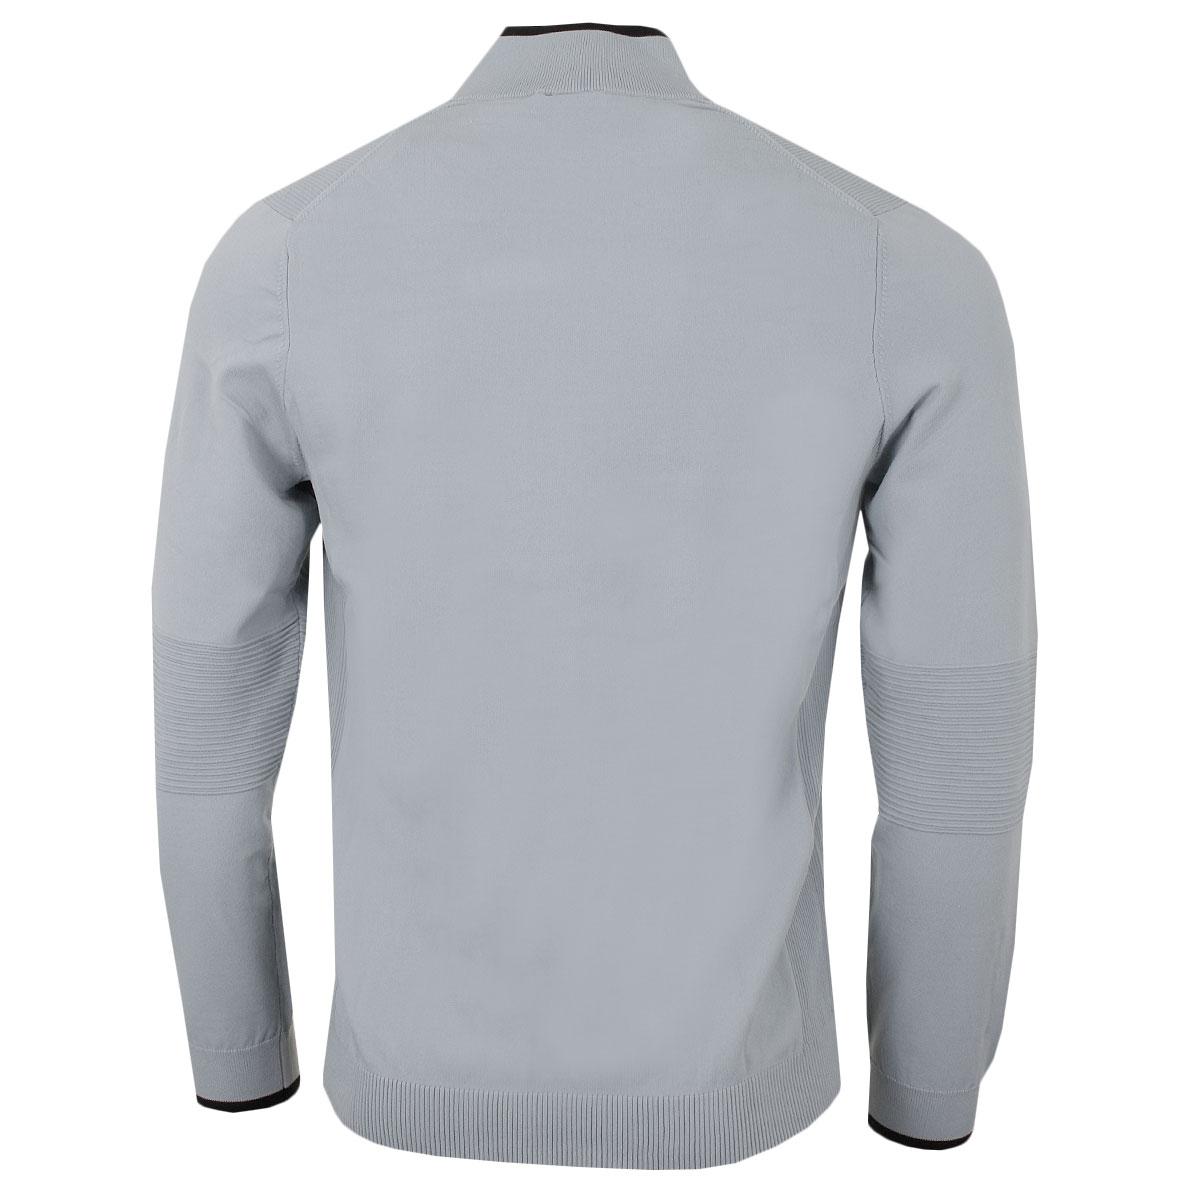 Puma-Golf-Mens-Evoknit-1-4-Zip-Ribbing-Breathable-Sweater-49-OFF-RRP thumbnail 5